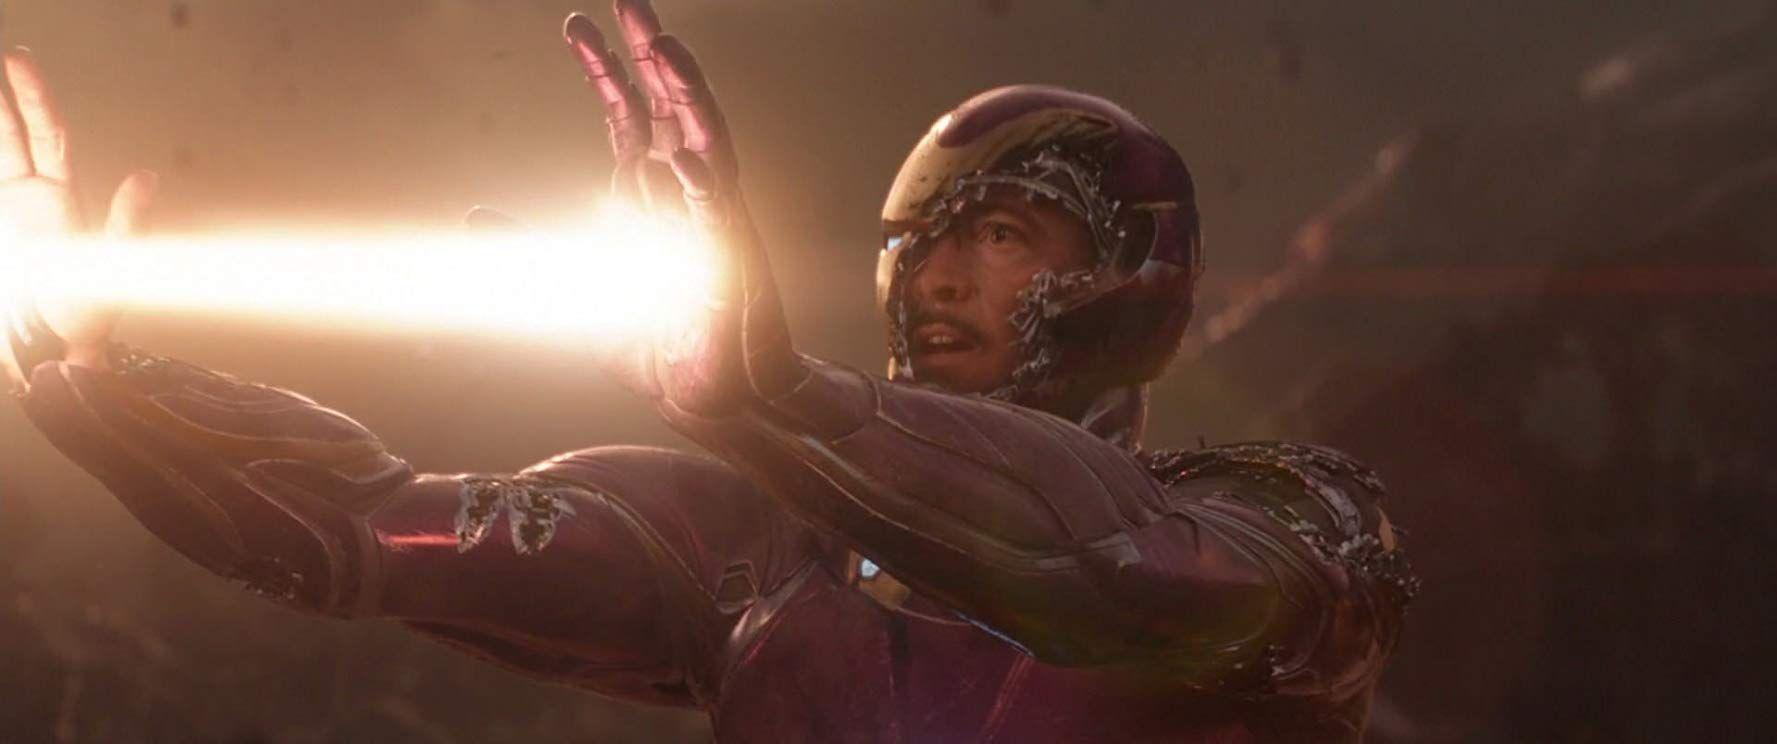 Mozi Filmek Hu Hd Teljes Film Magyarul Aya Meureun Sugan Film Videa Infinity War Avengers Marvel Heroes